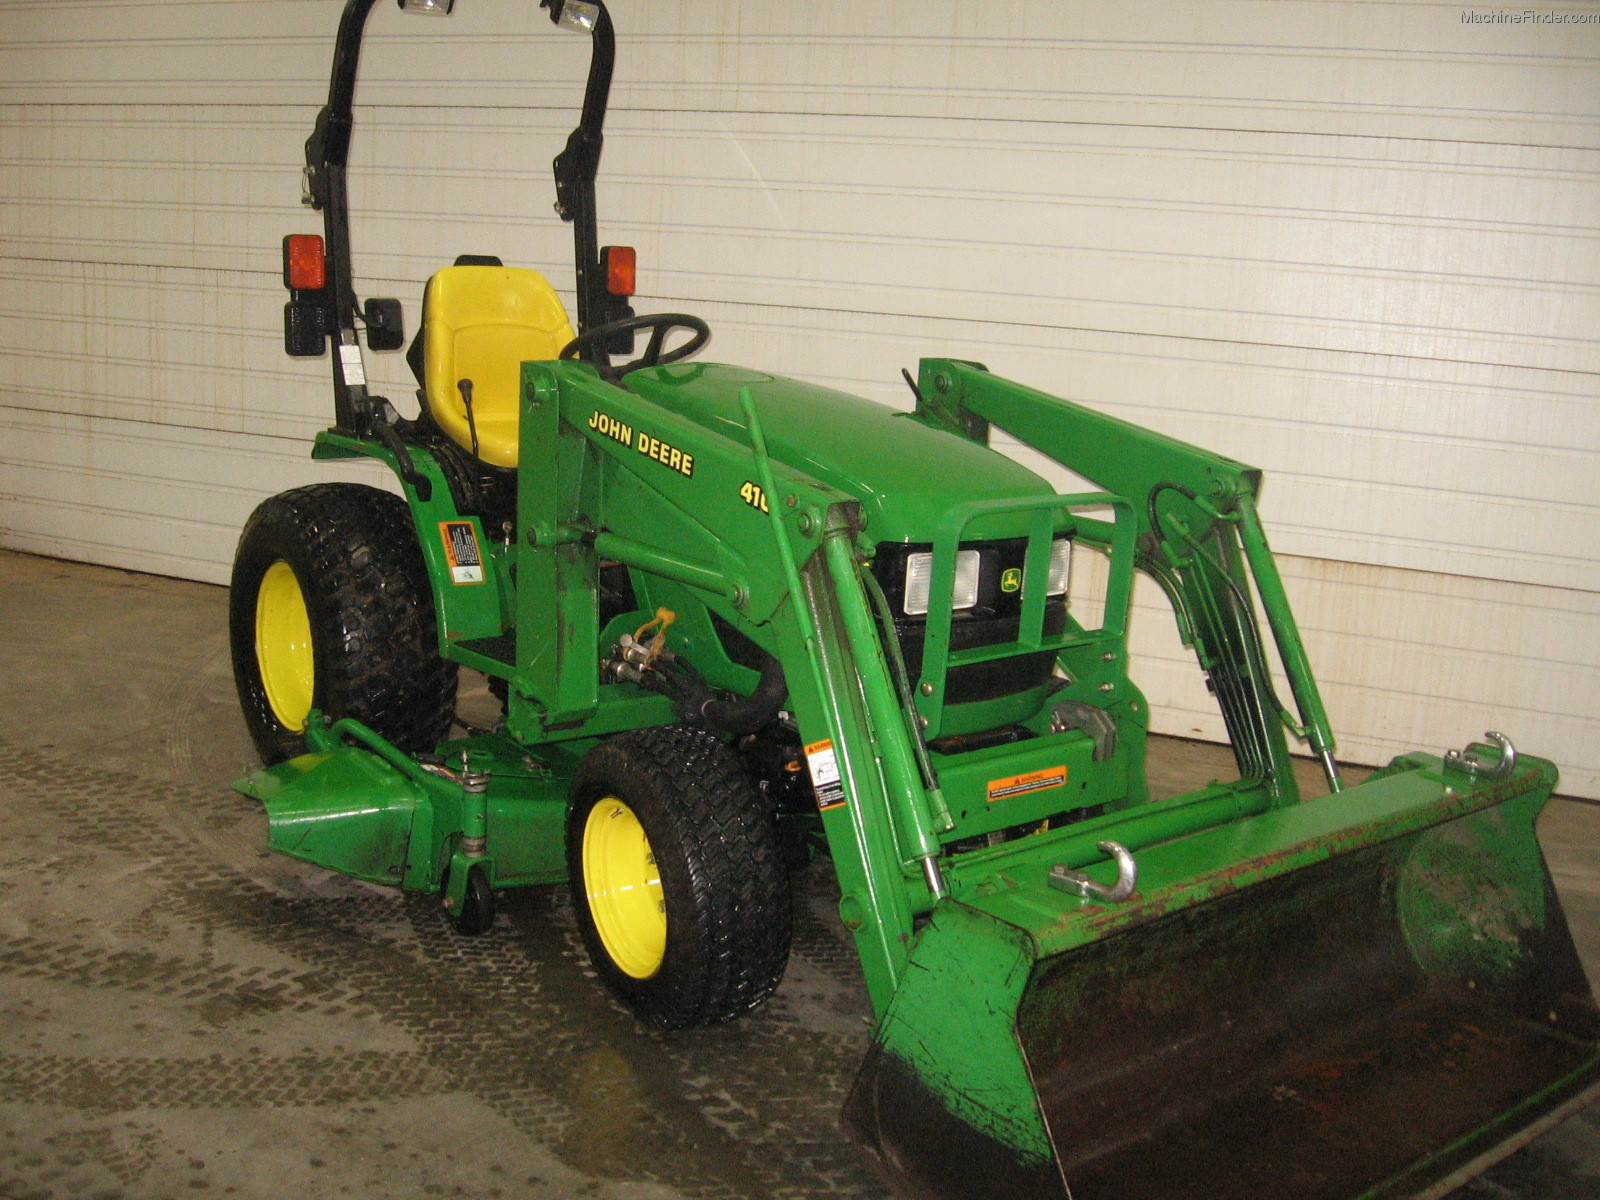 2002 John Deere 4110 Tractors - Compact (1-40hp.) - John ...